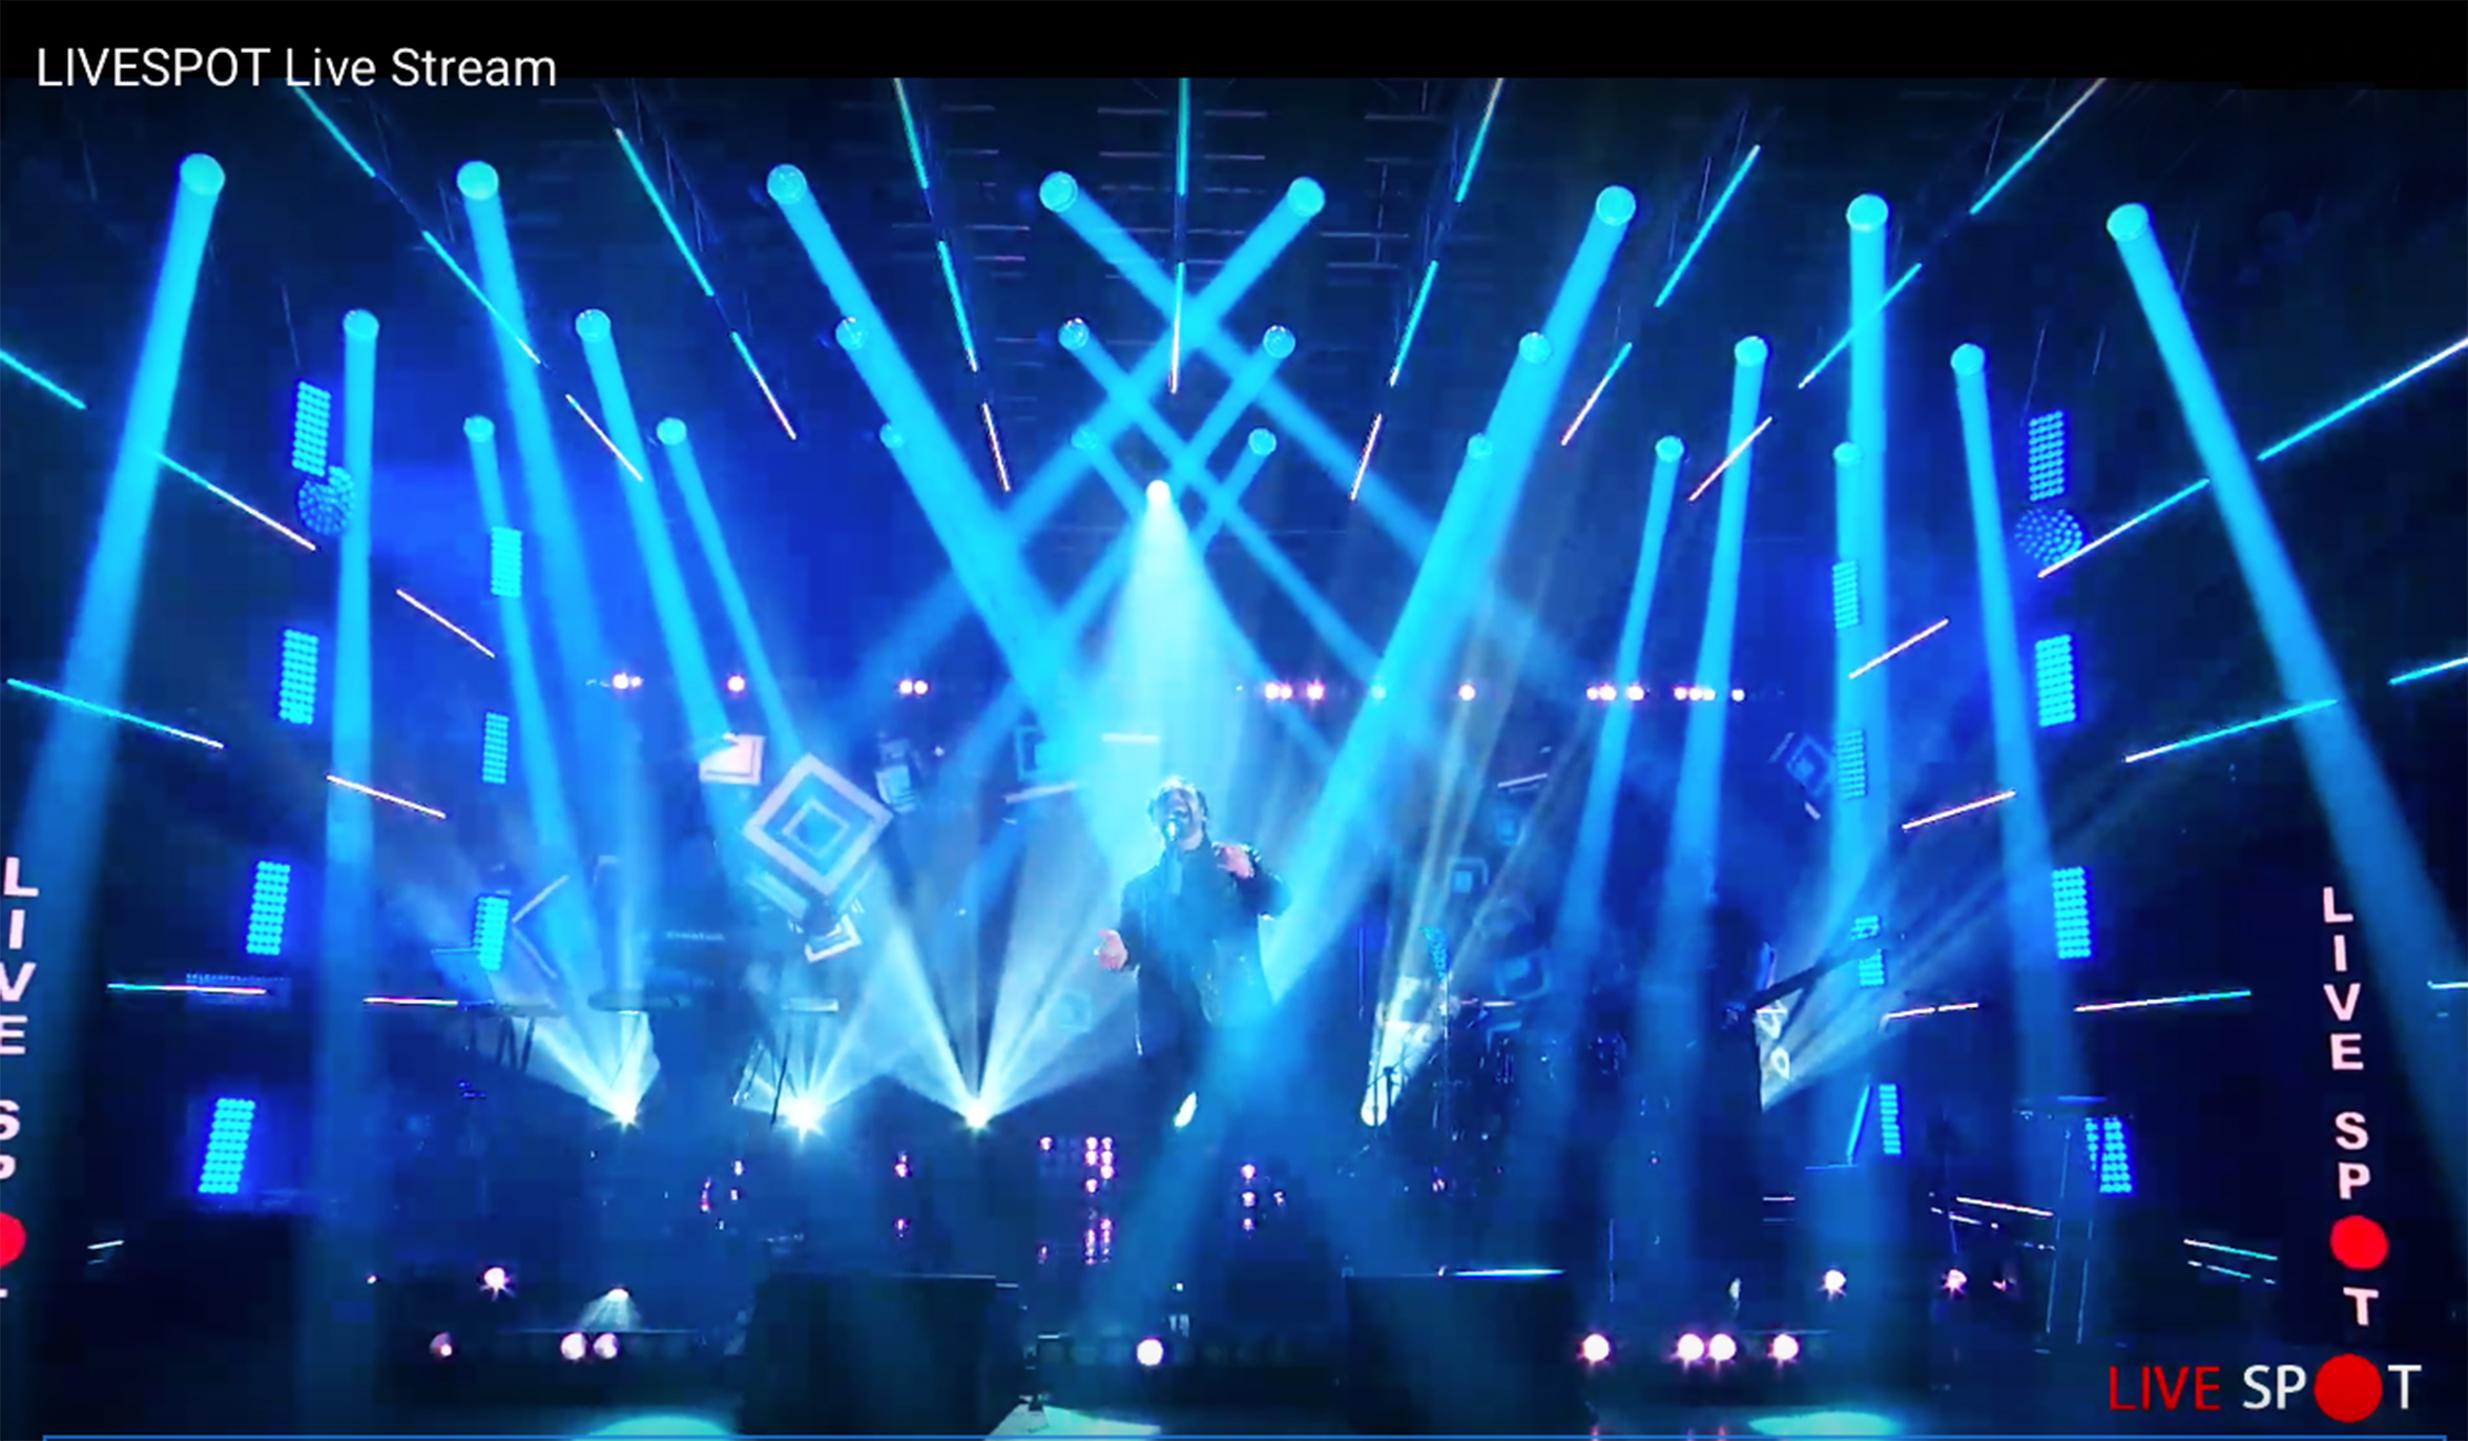 LIVESPOT Live Stream. Gabriel Kupatadze.